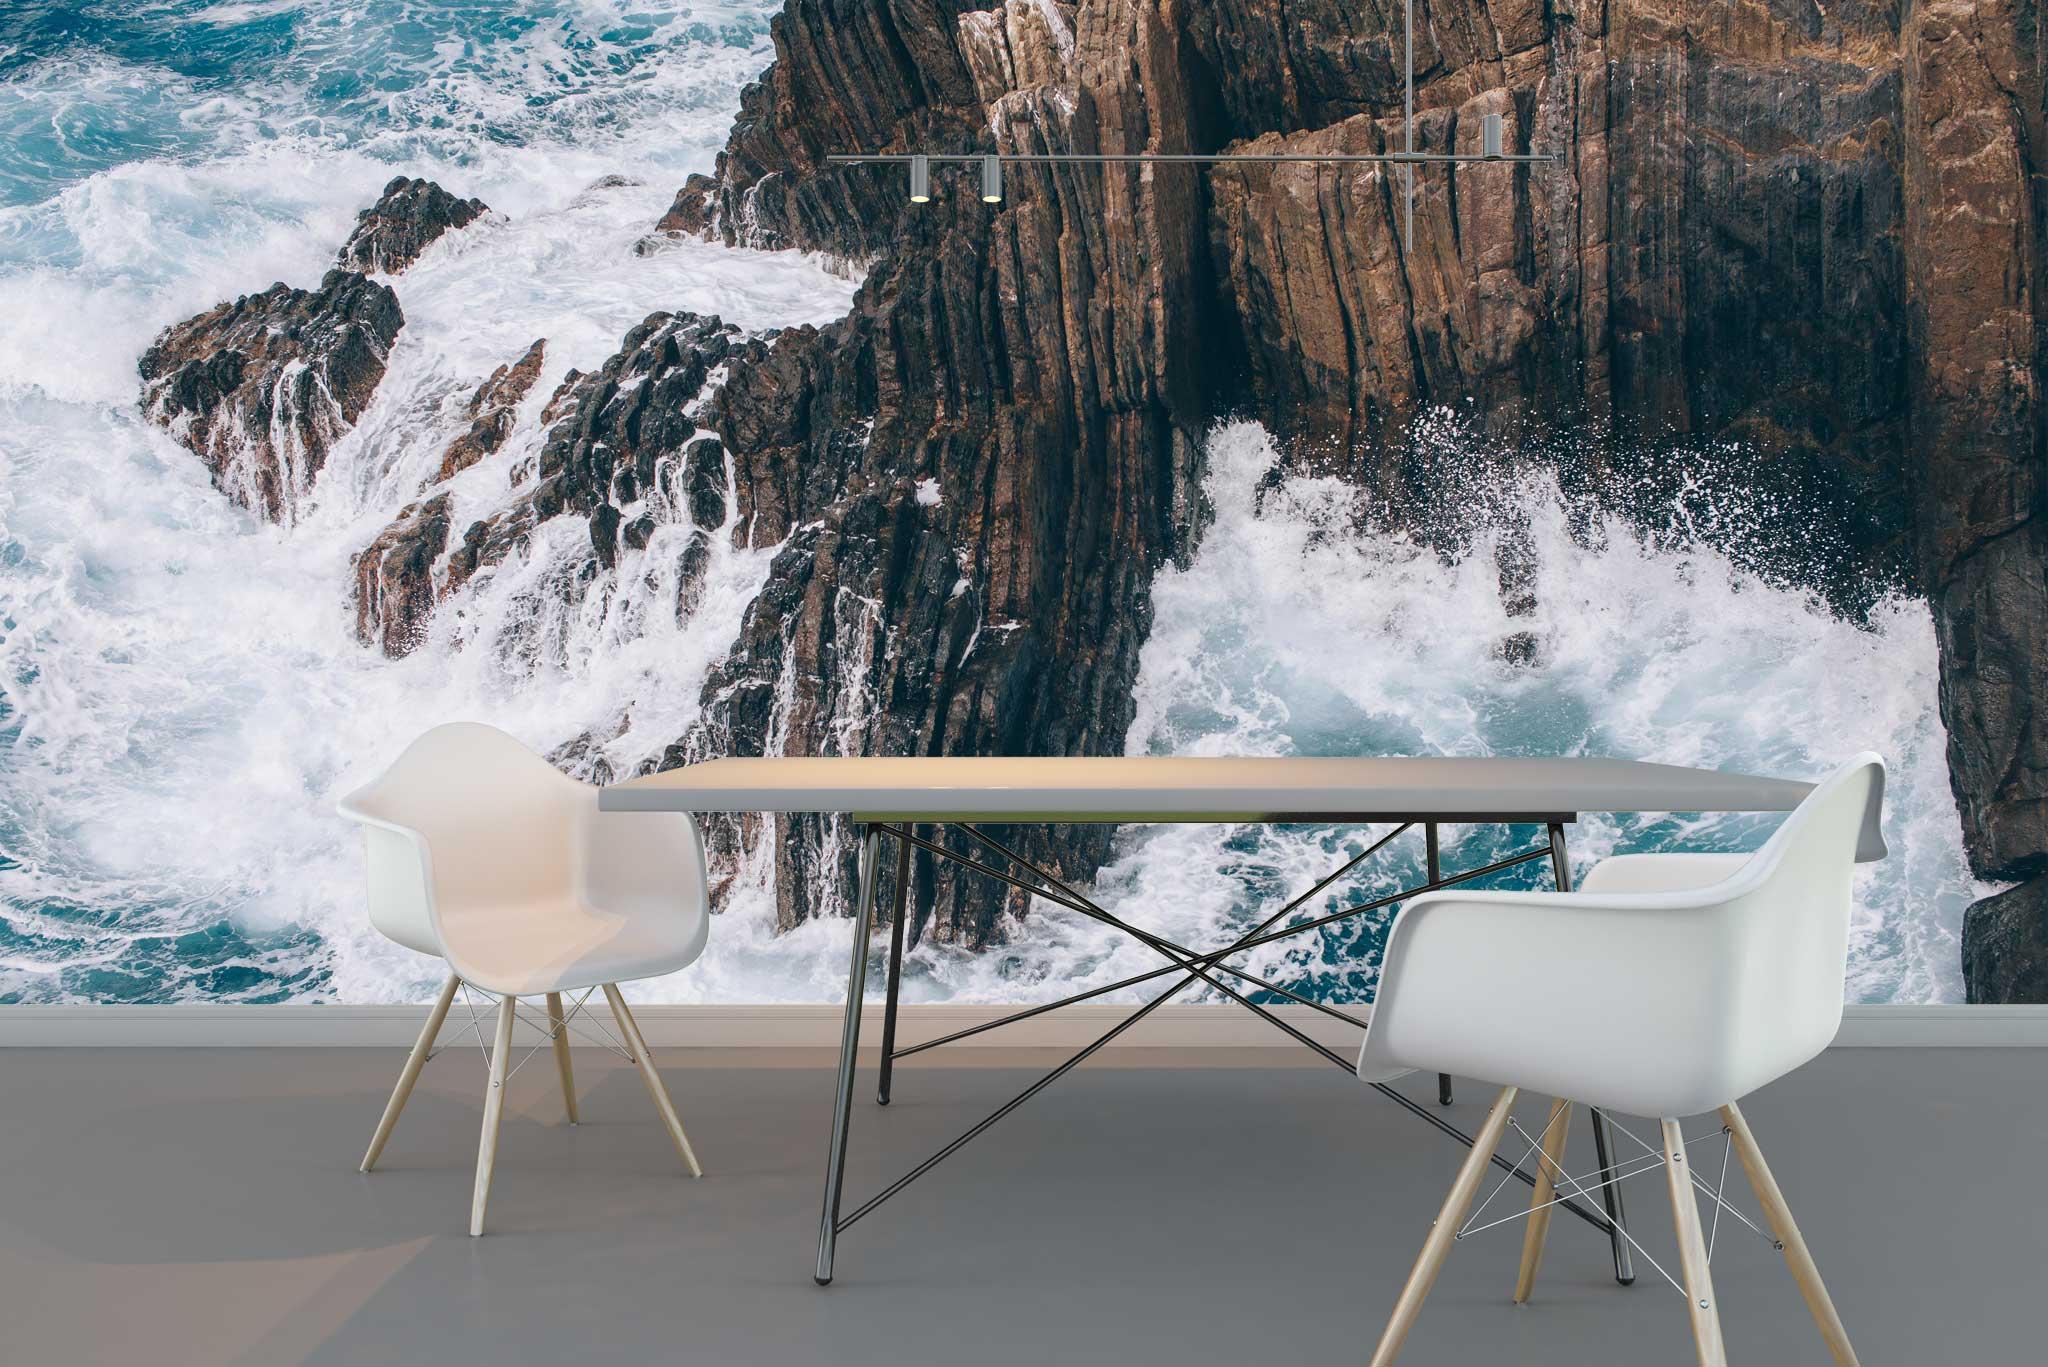 tapet-fototapet-comanda-personalizat-bucuresti-perete-special-lux-model-fotografie-peisaj-mare-ocean-stanci